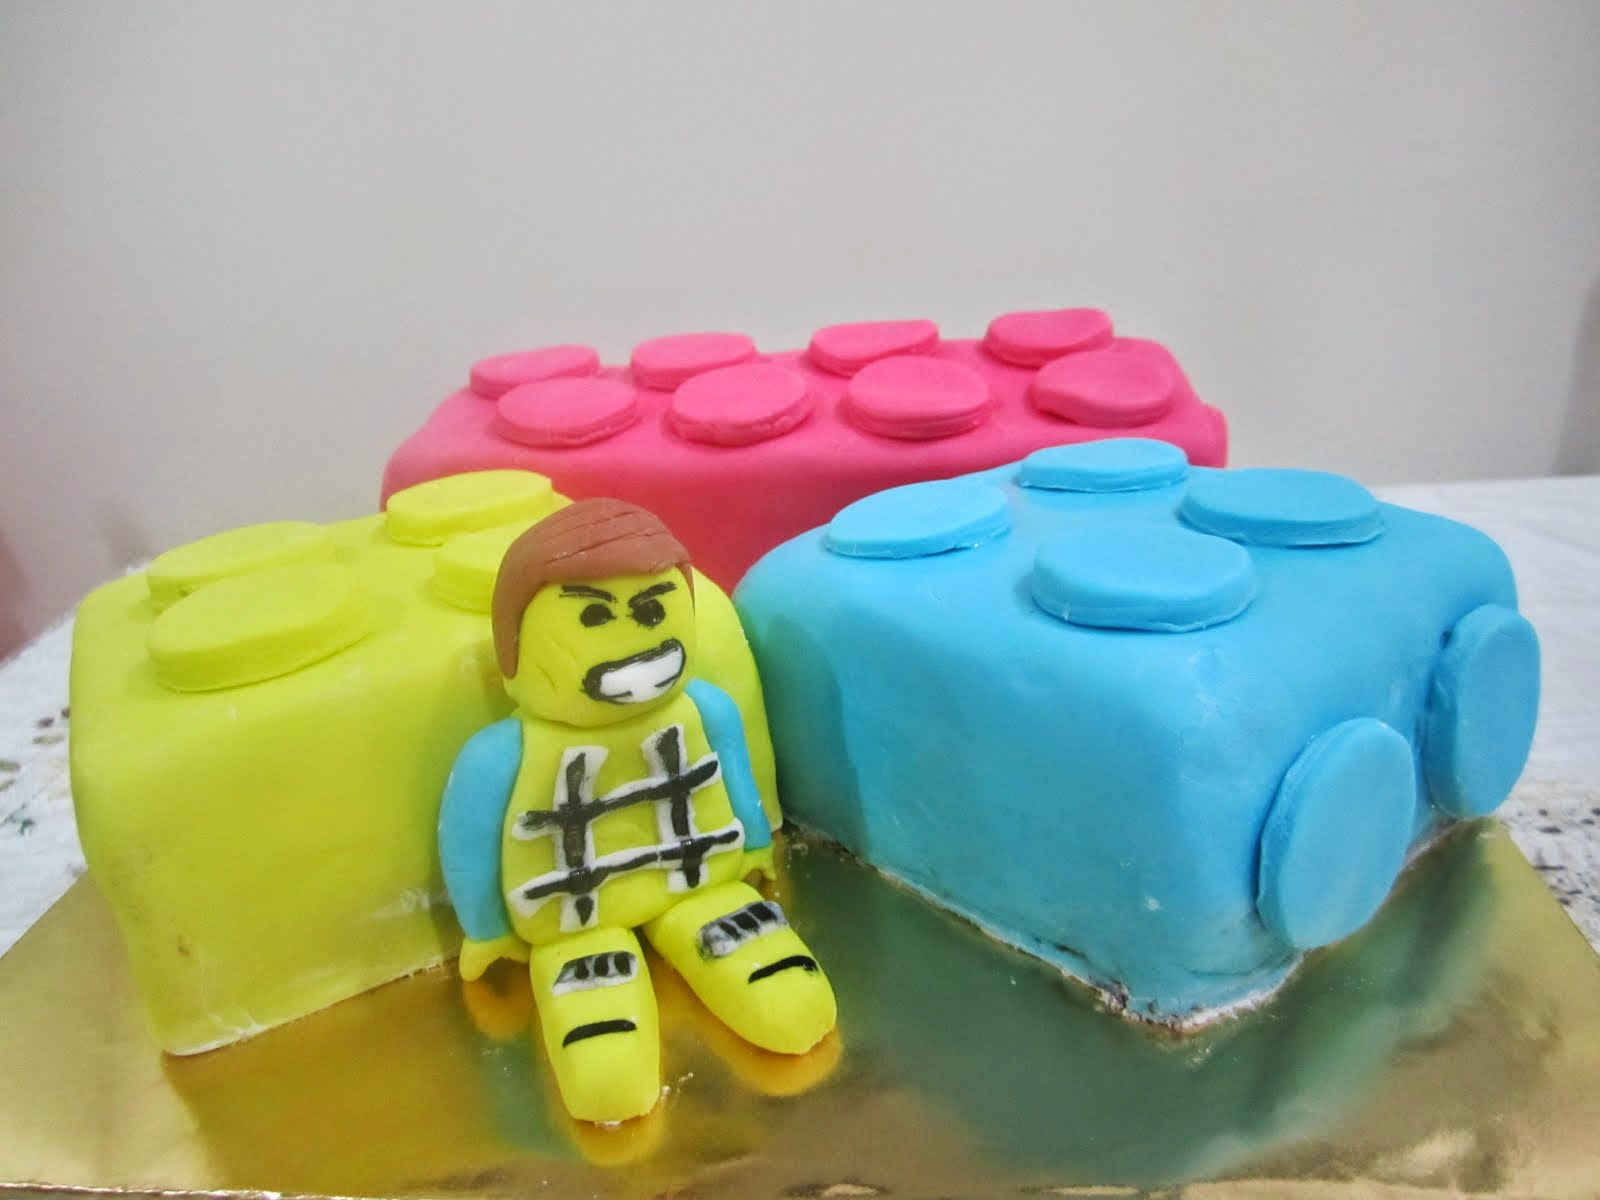 Lego Cake for Birthday